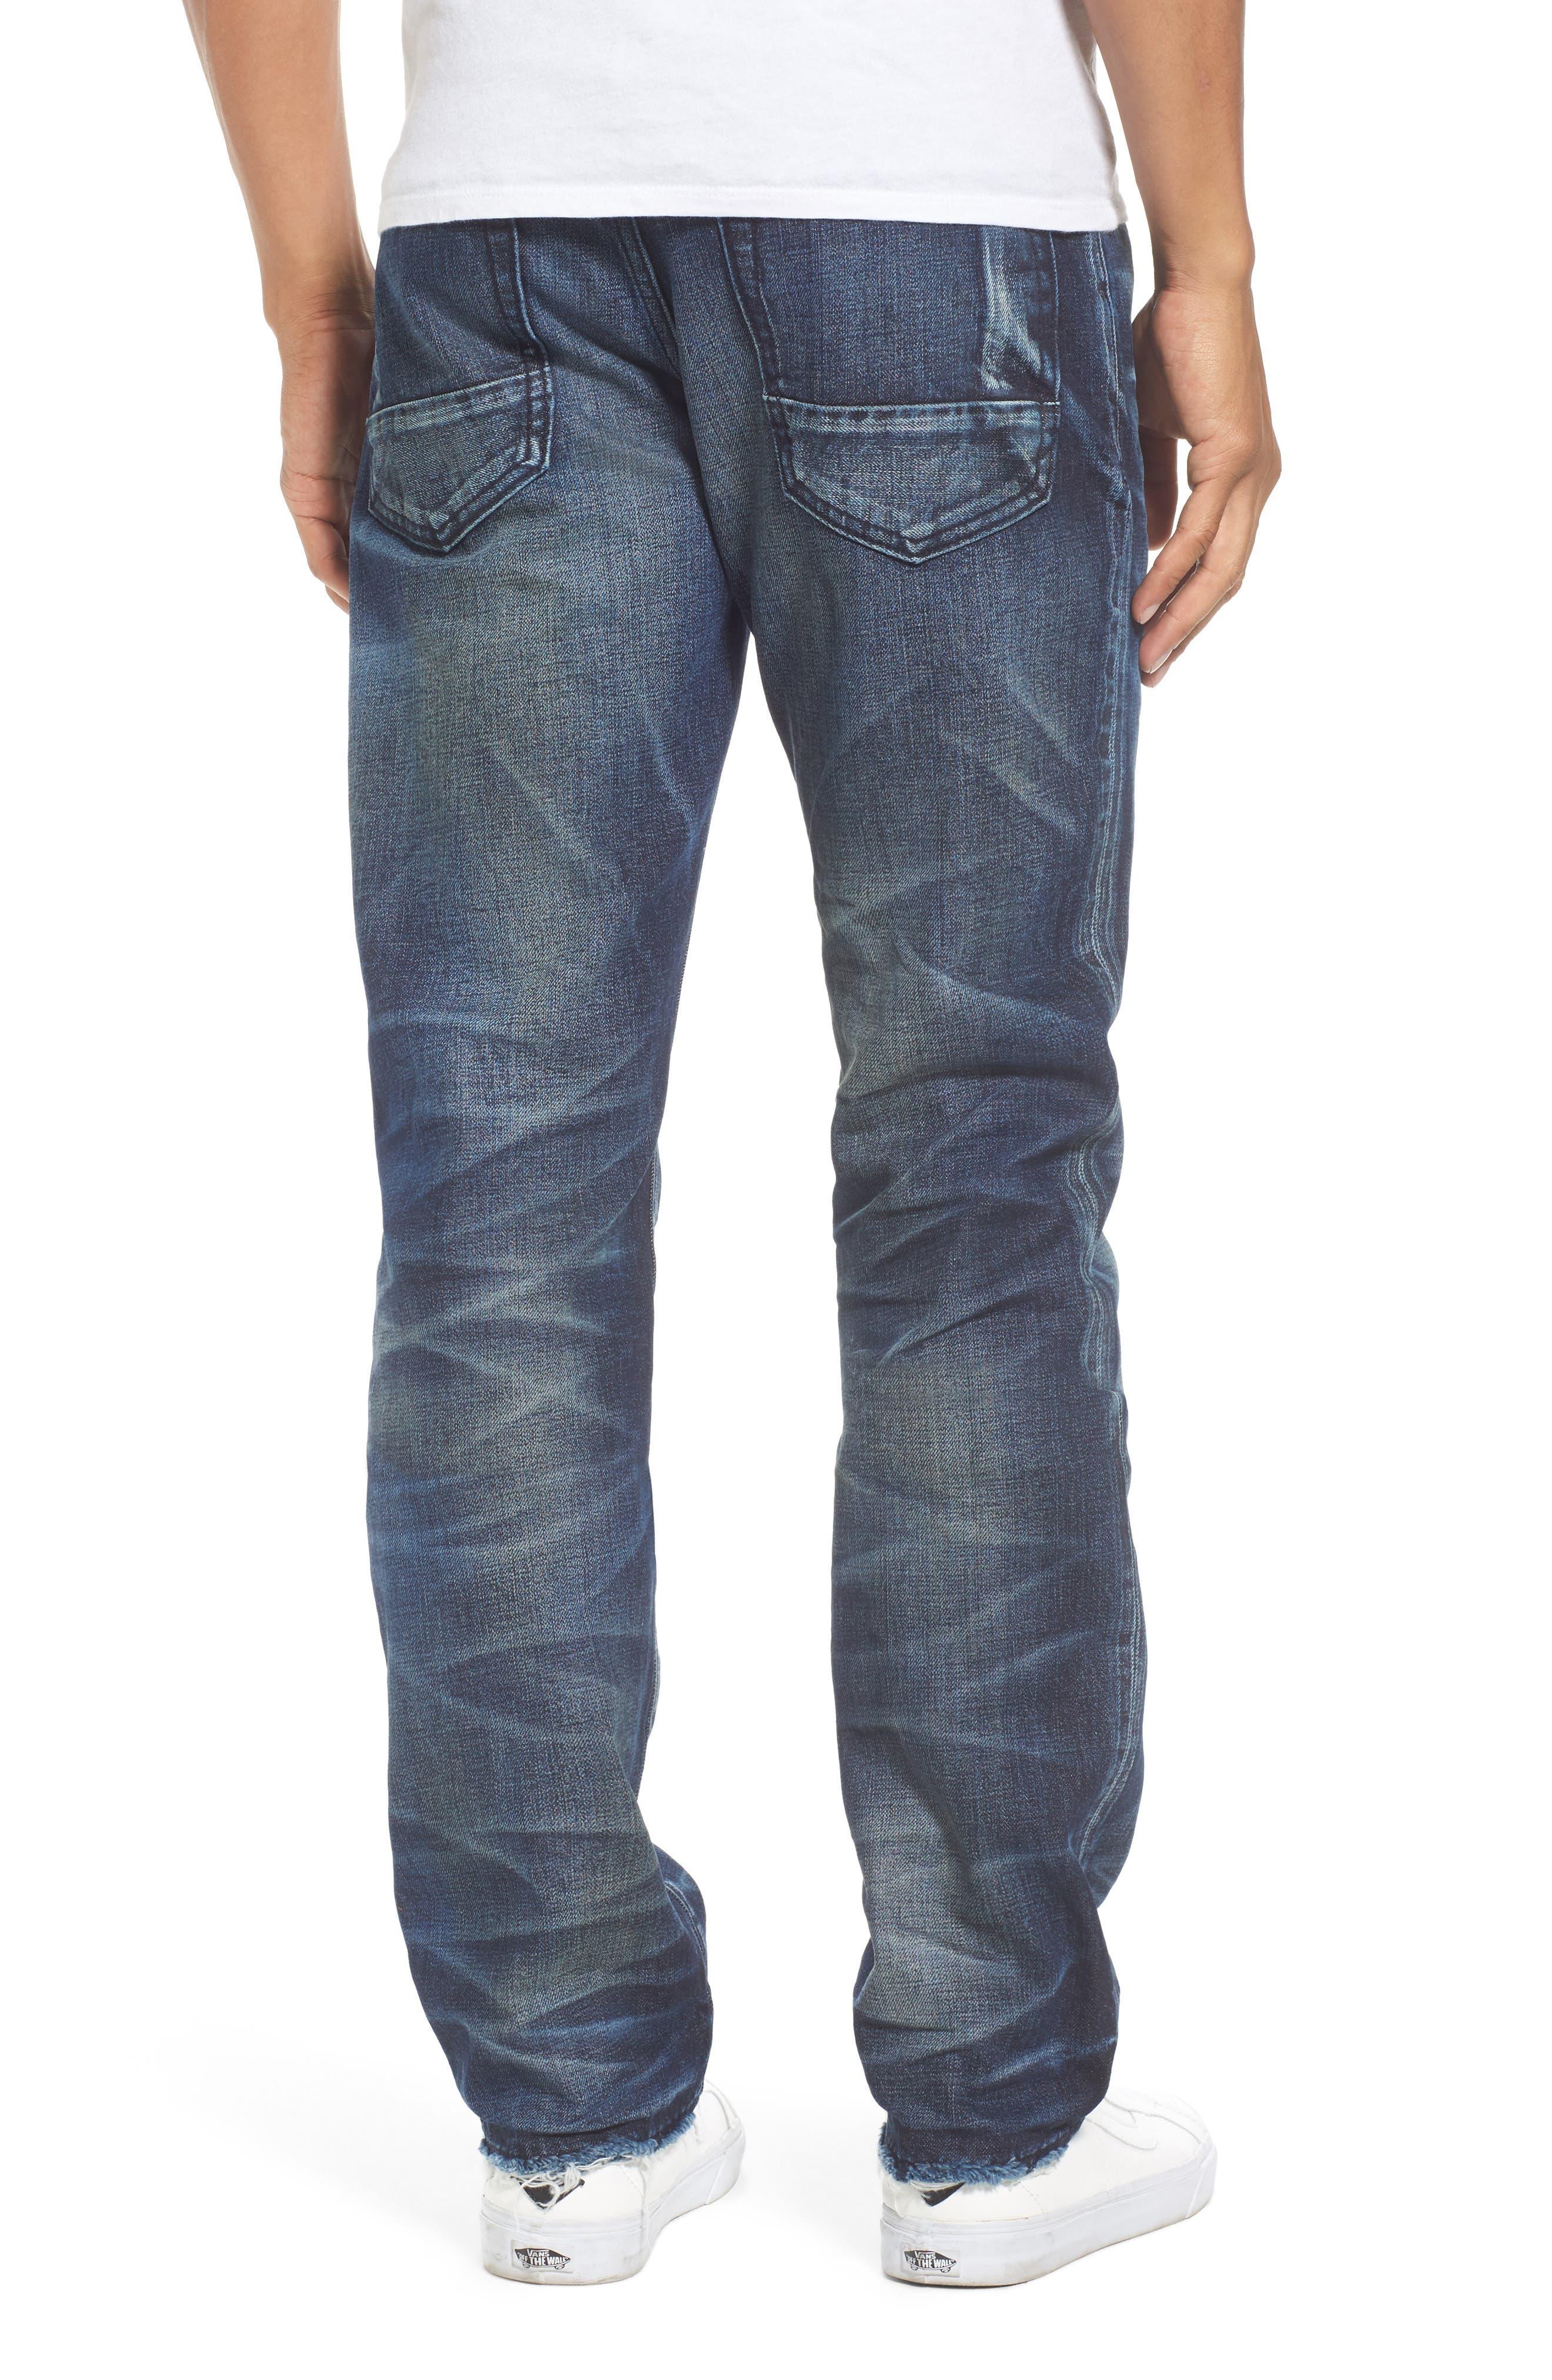 Demon Slim Straight Jeans,                             Alternate thumbnail 2, color,                             INDIGO